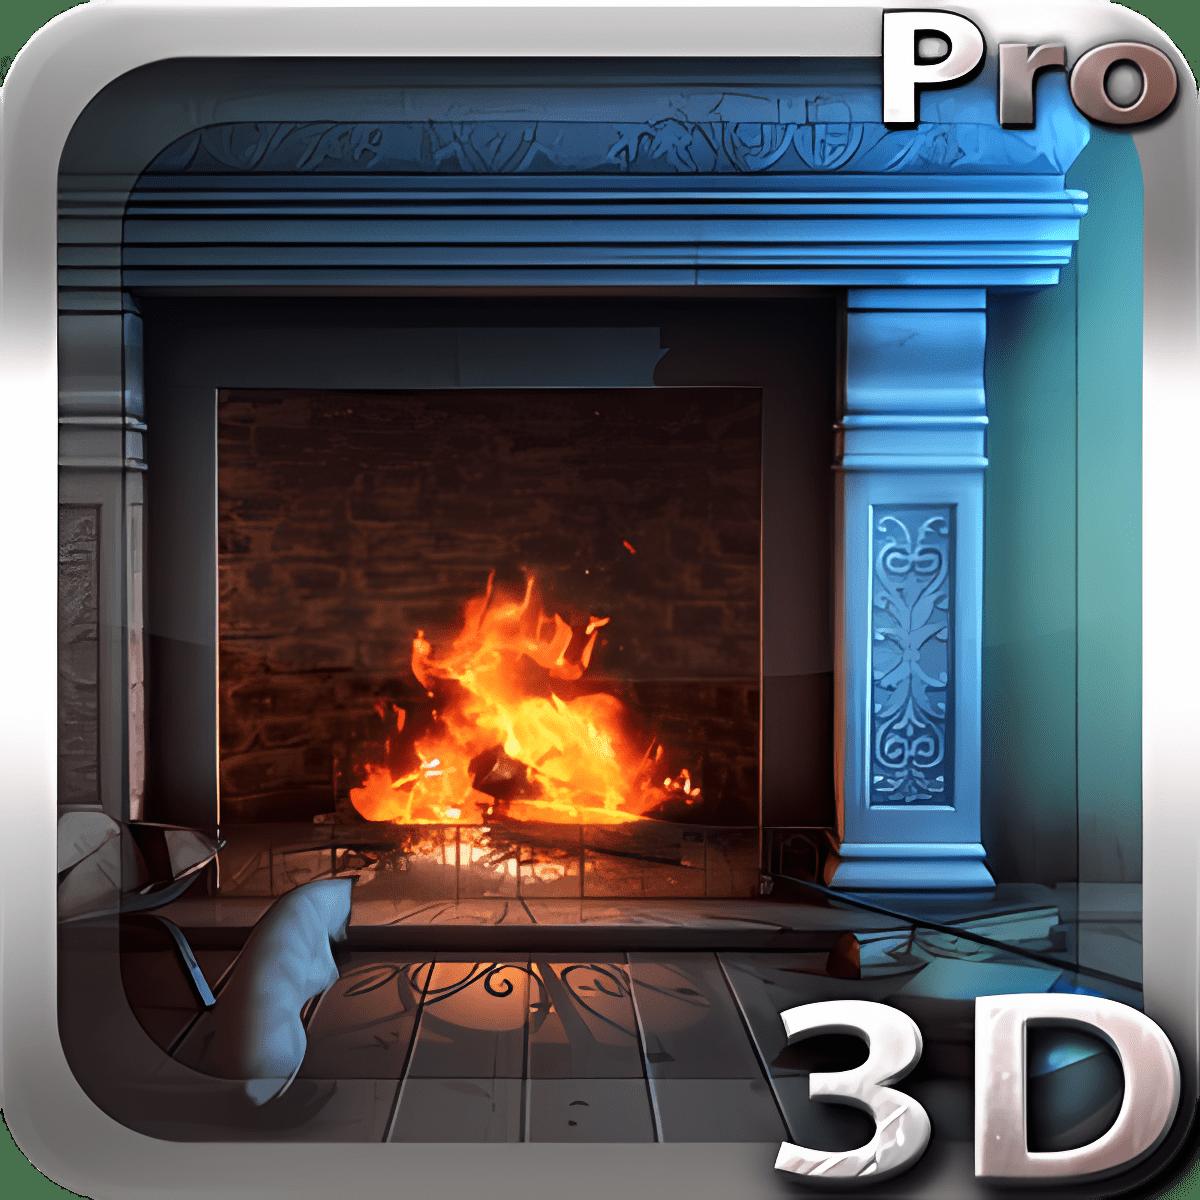 Fireplace 3D Pro lwp 1.1